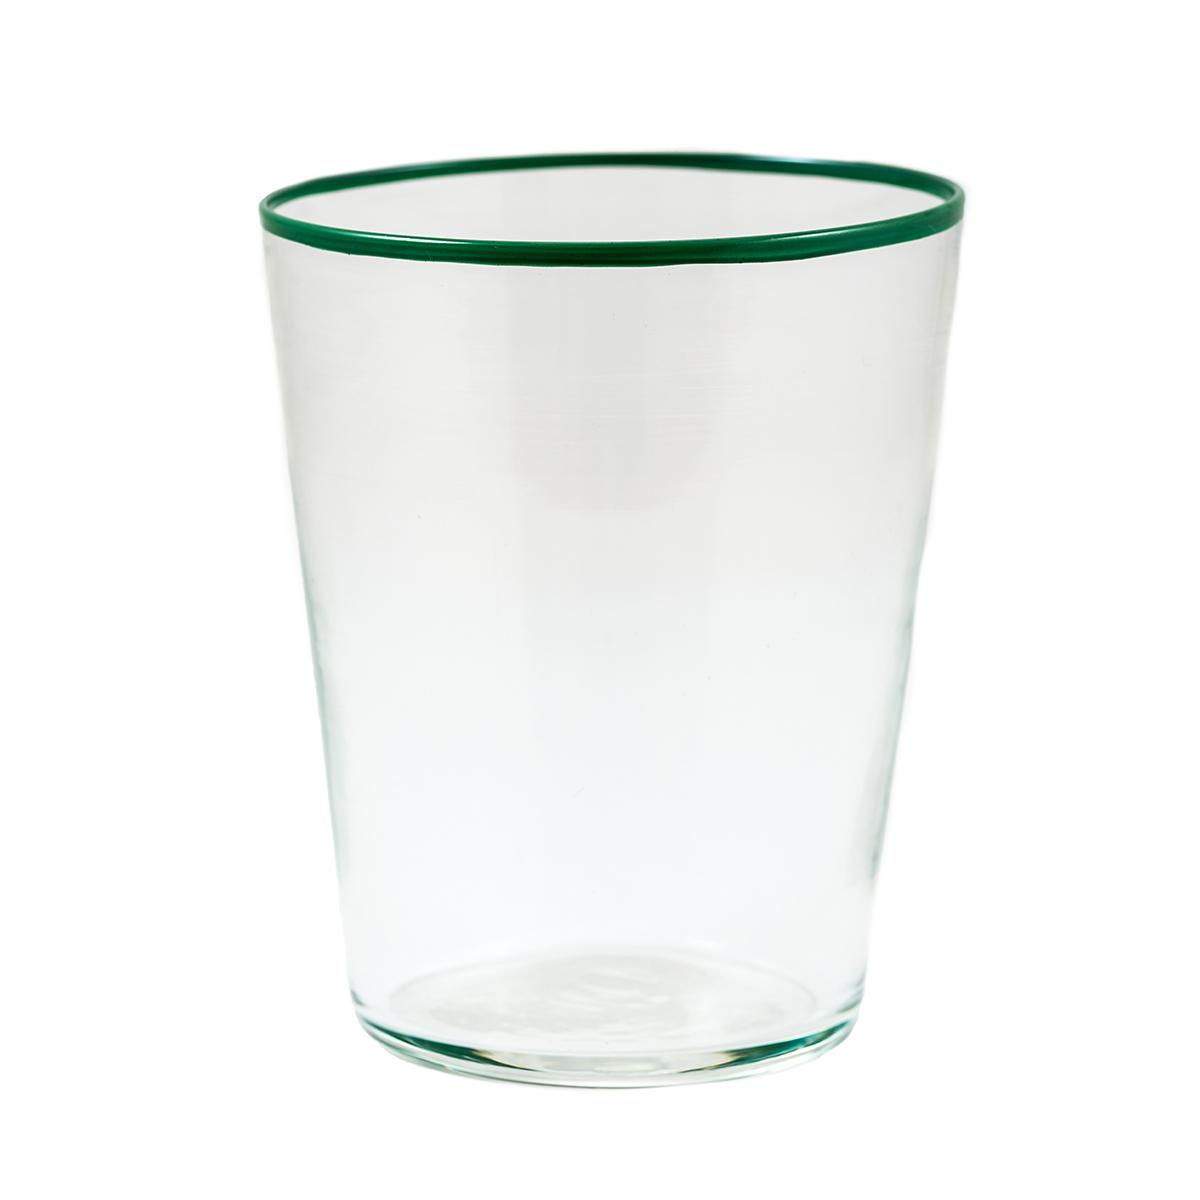 spring-rim-green-glass-crystal